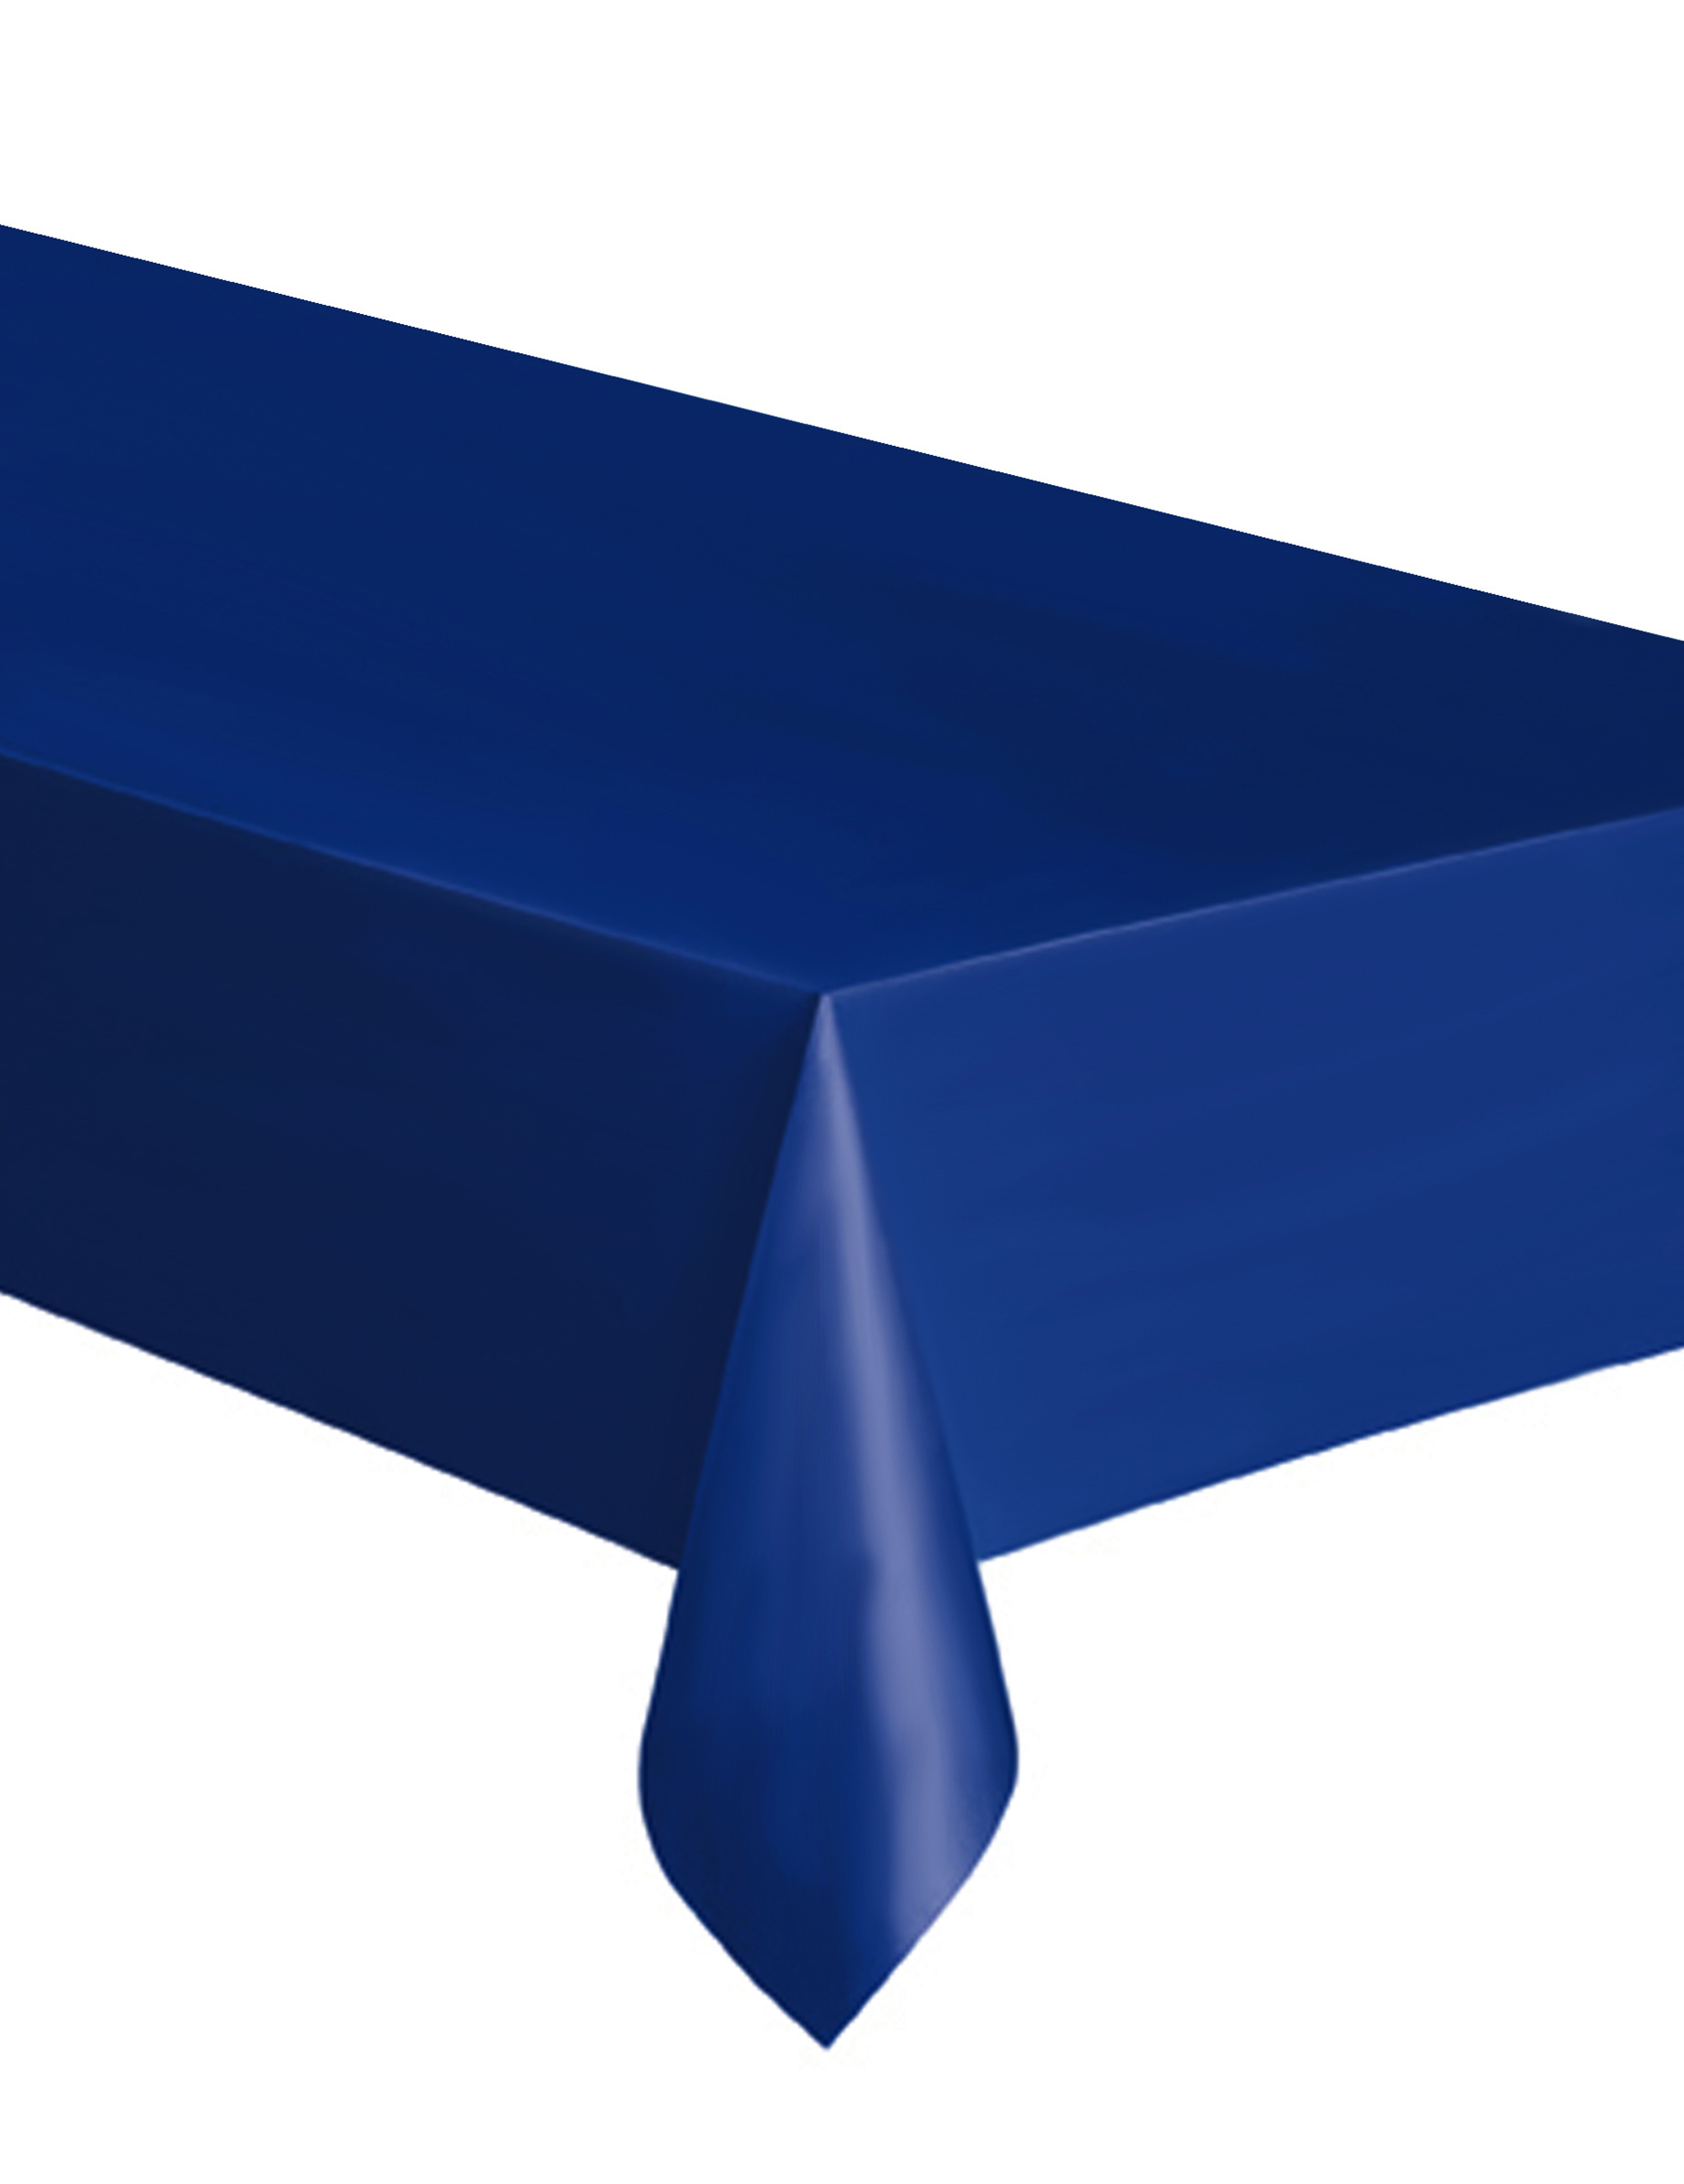 nappe en plastique bleu marine 137 x 274 cm d coration. Black Bedroom Furniture Sets. Home Design Ideas